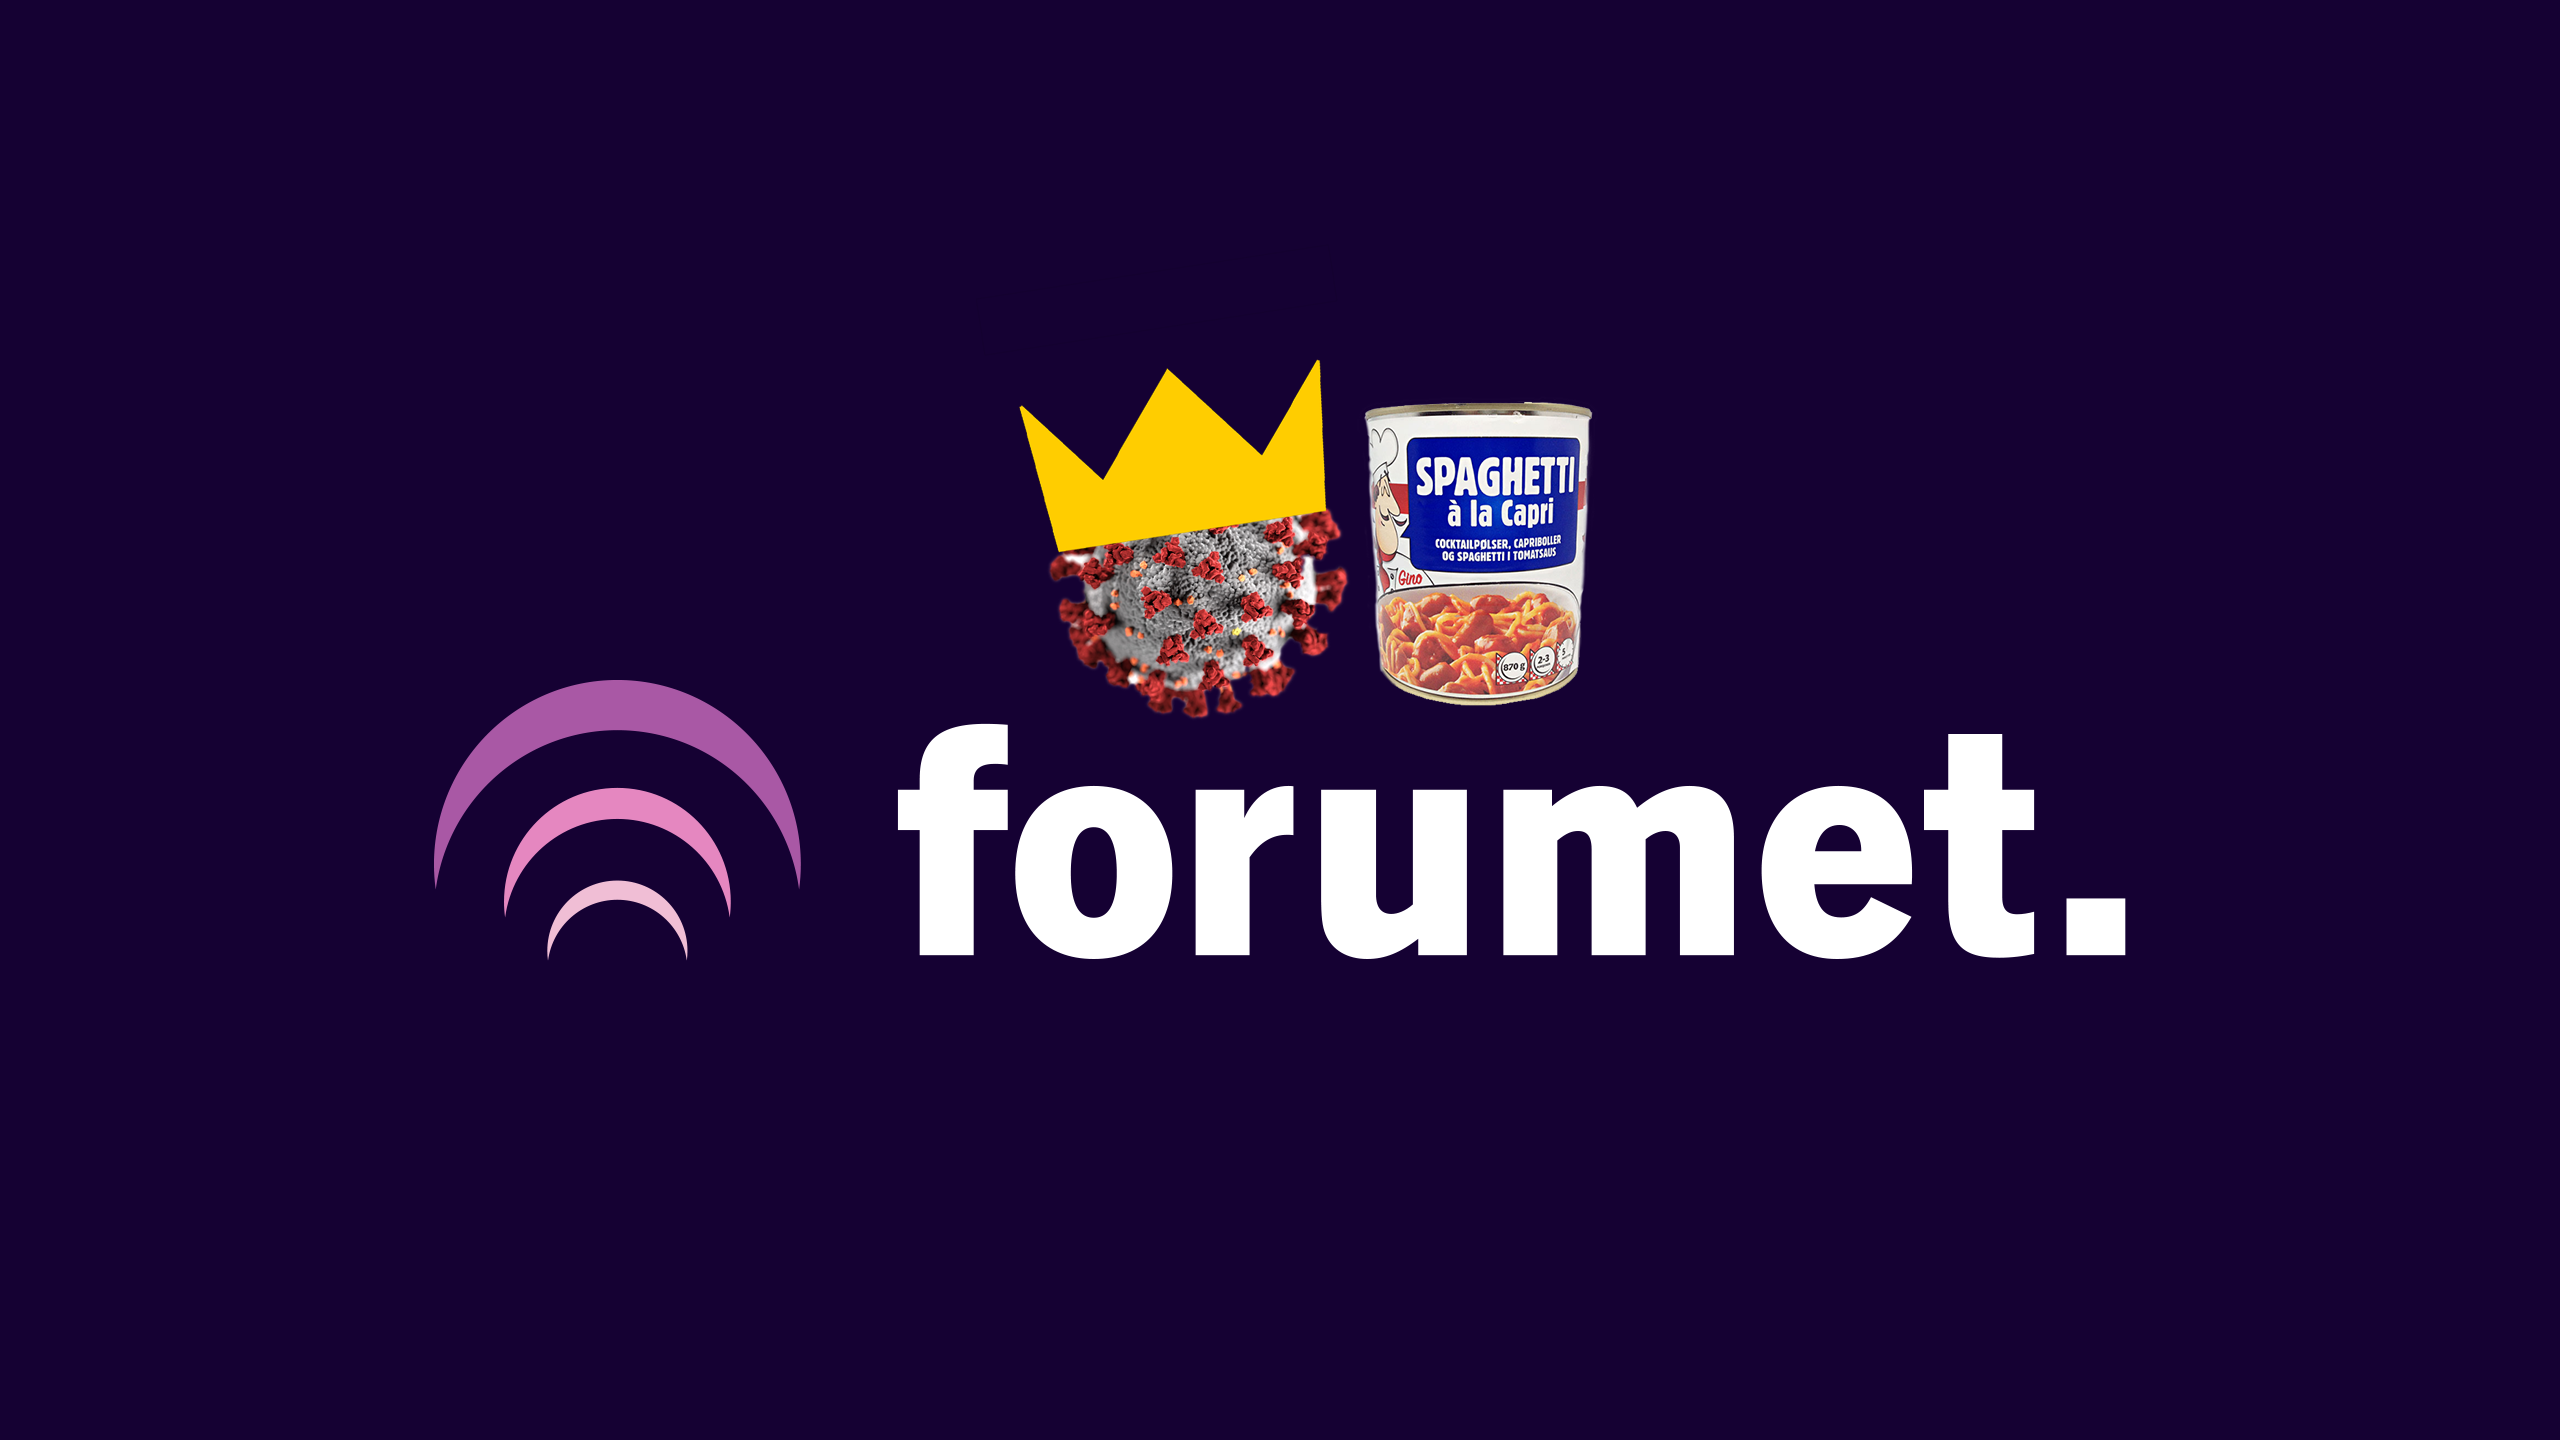 Ny episode av Forumet